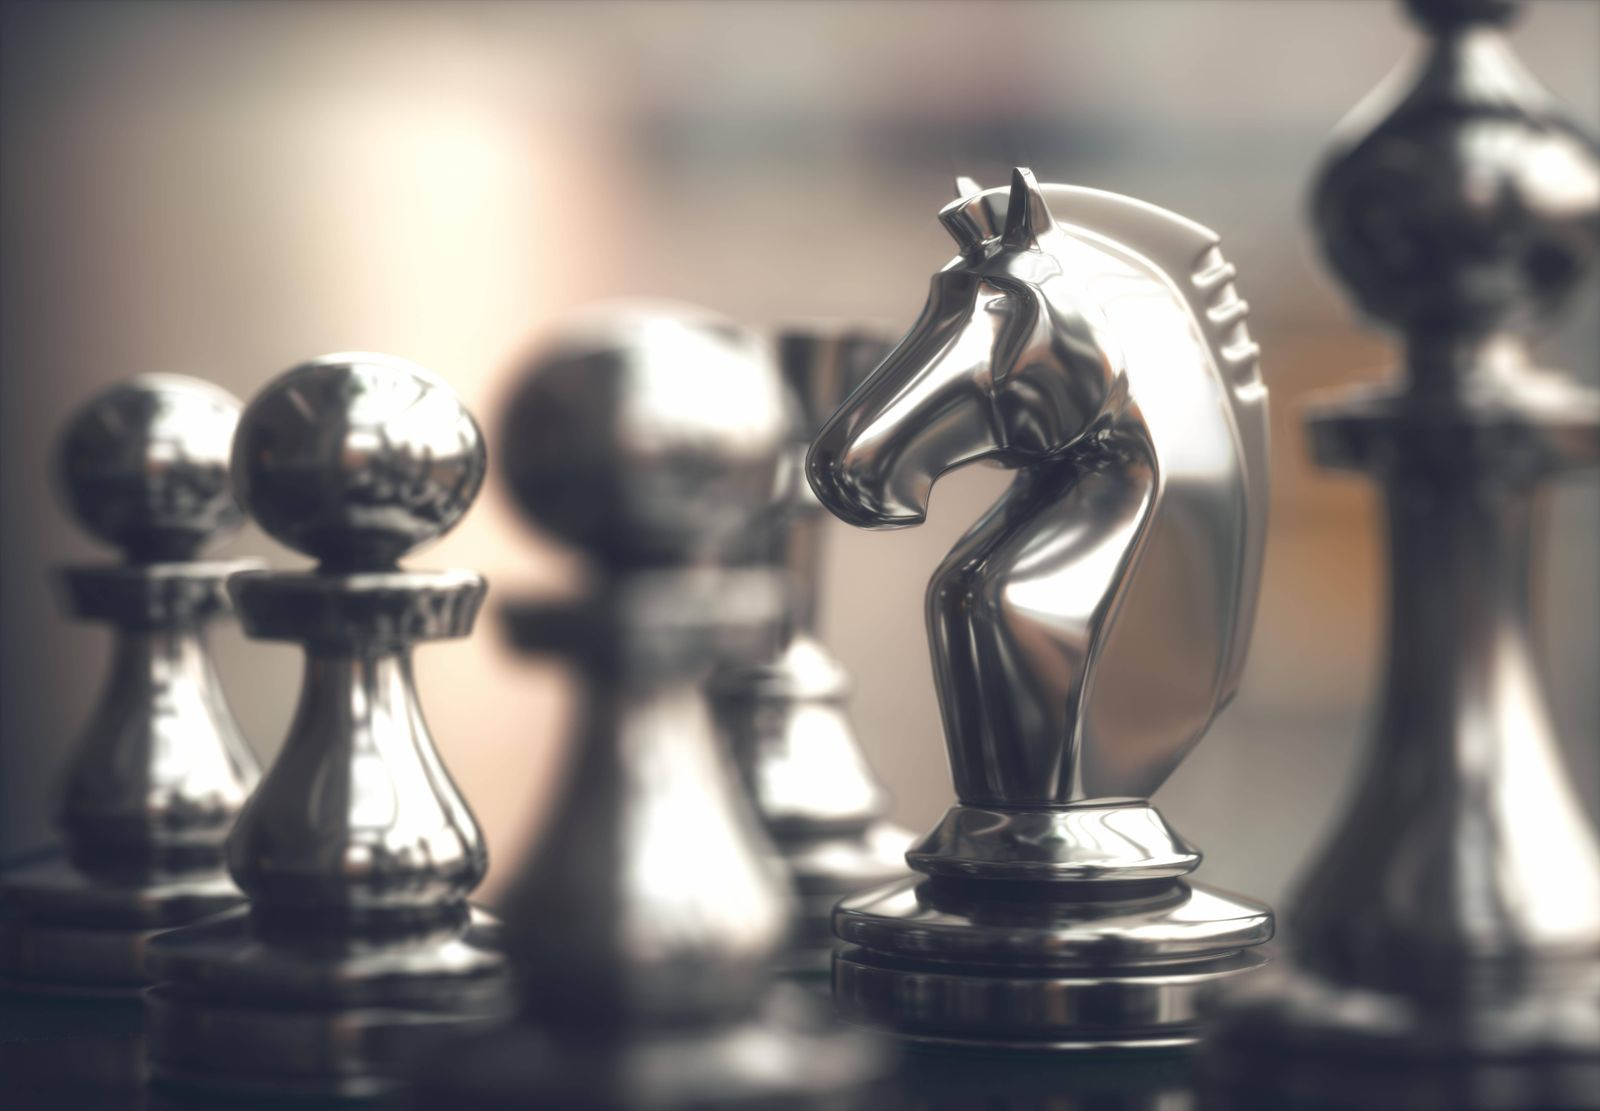 Chess Pieces Gameboard PUBLICATIONxINxGERxSUIxAUTxONLY Copyright xktsdesignx Panthermedia23646566